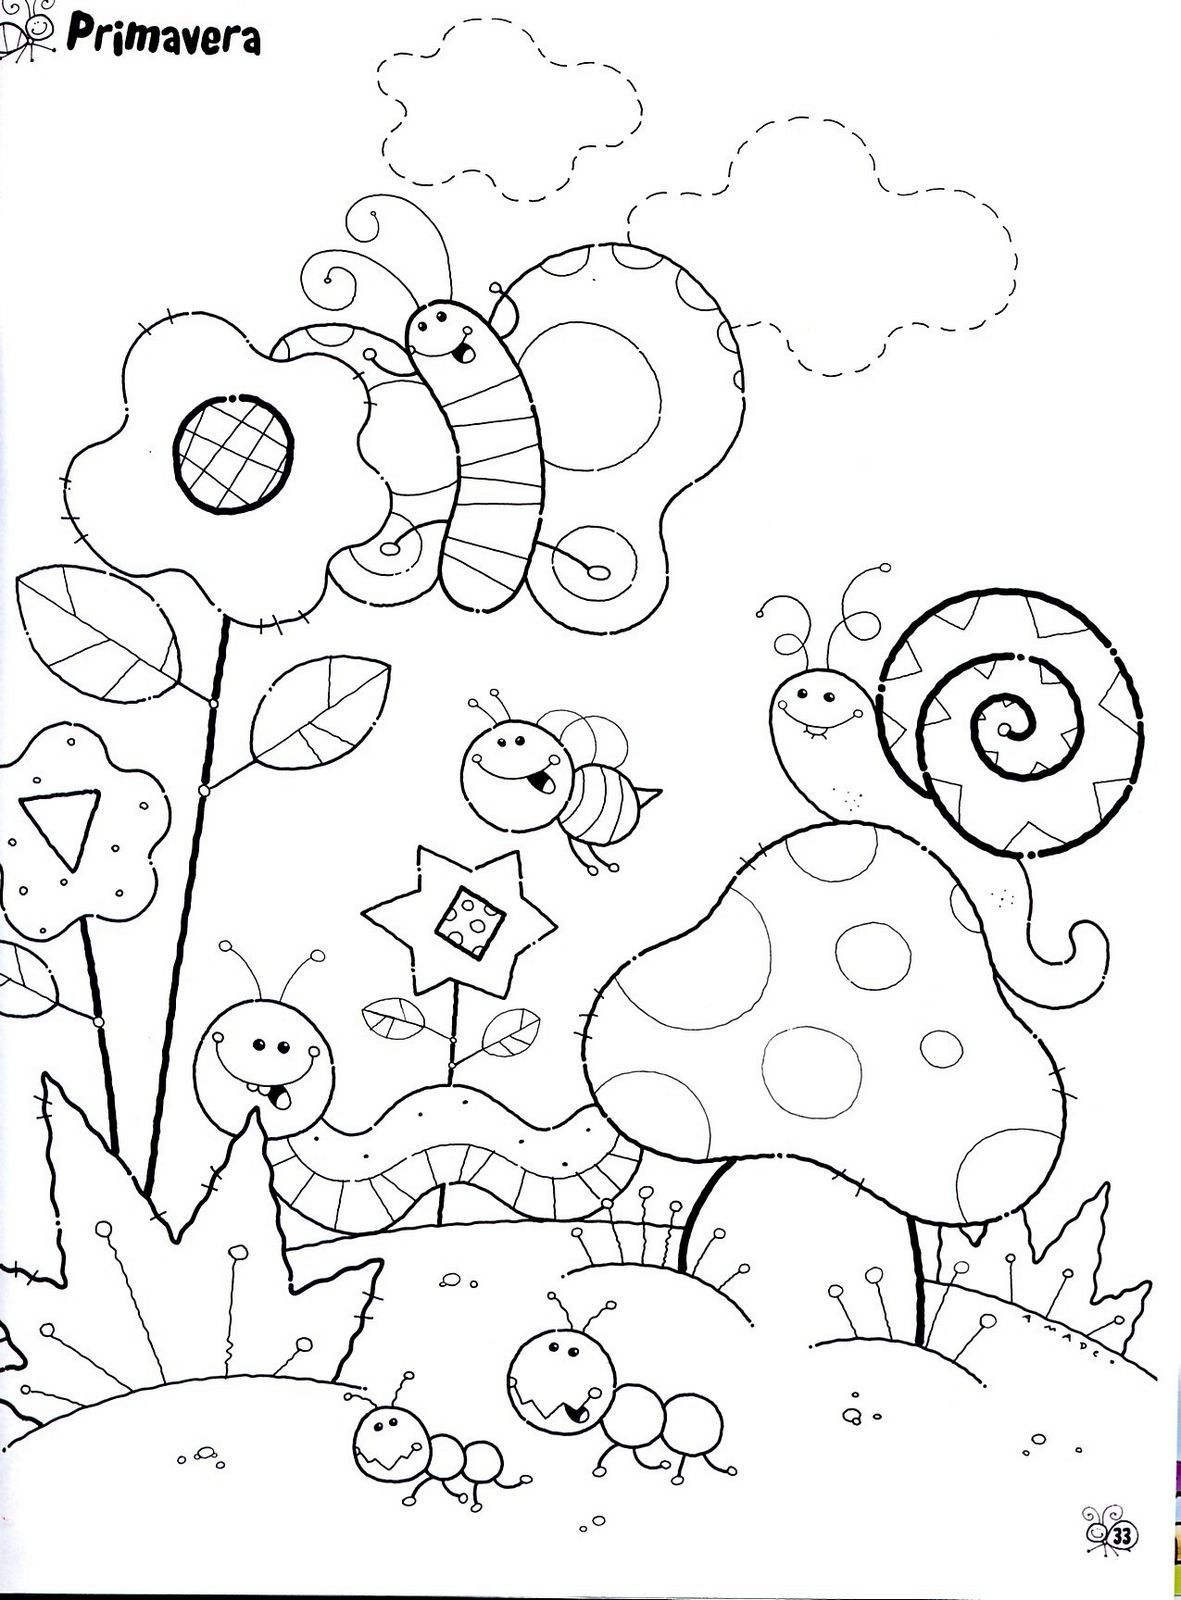 Cute for a bib | Coloring Pages | Pinterest | Ausmalbilder, Insekten ...